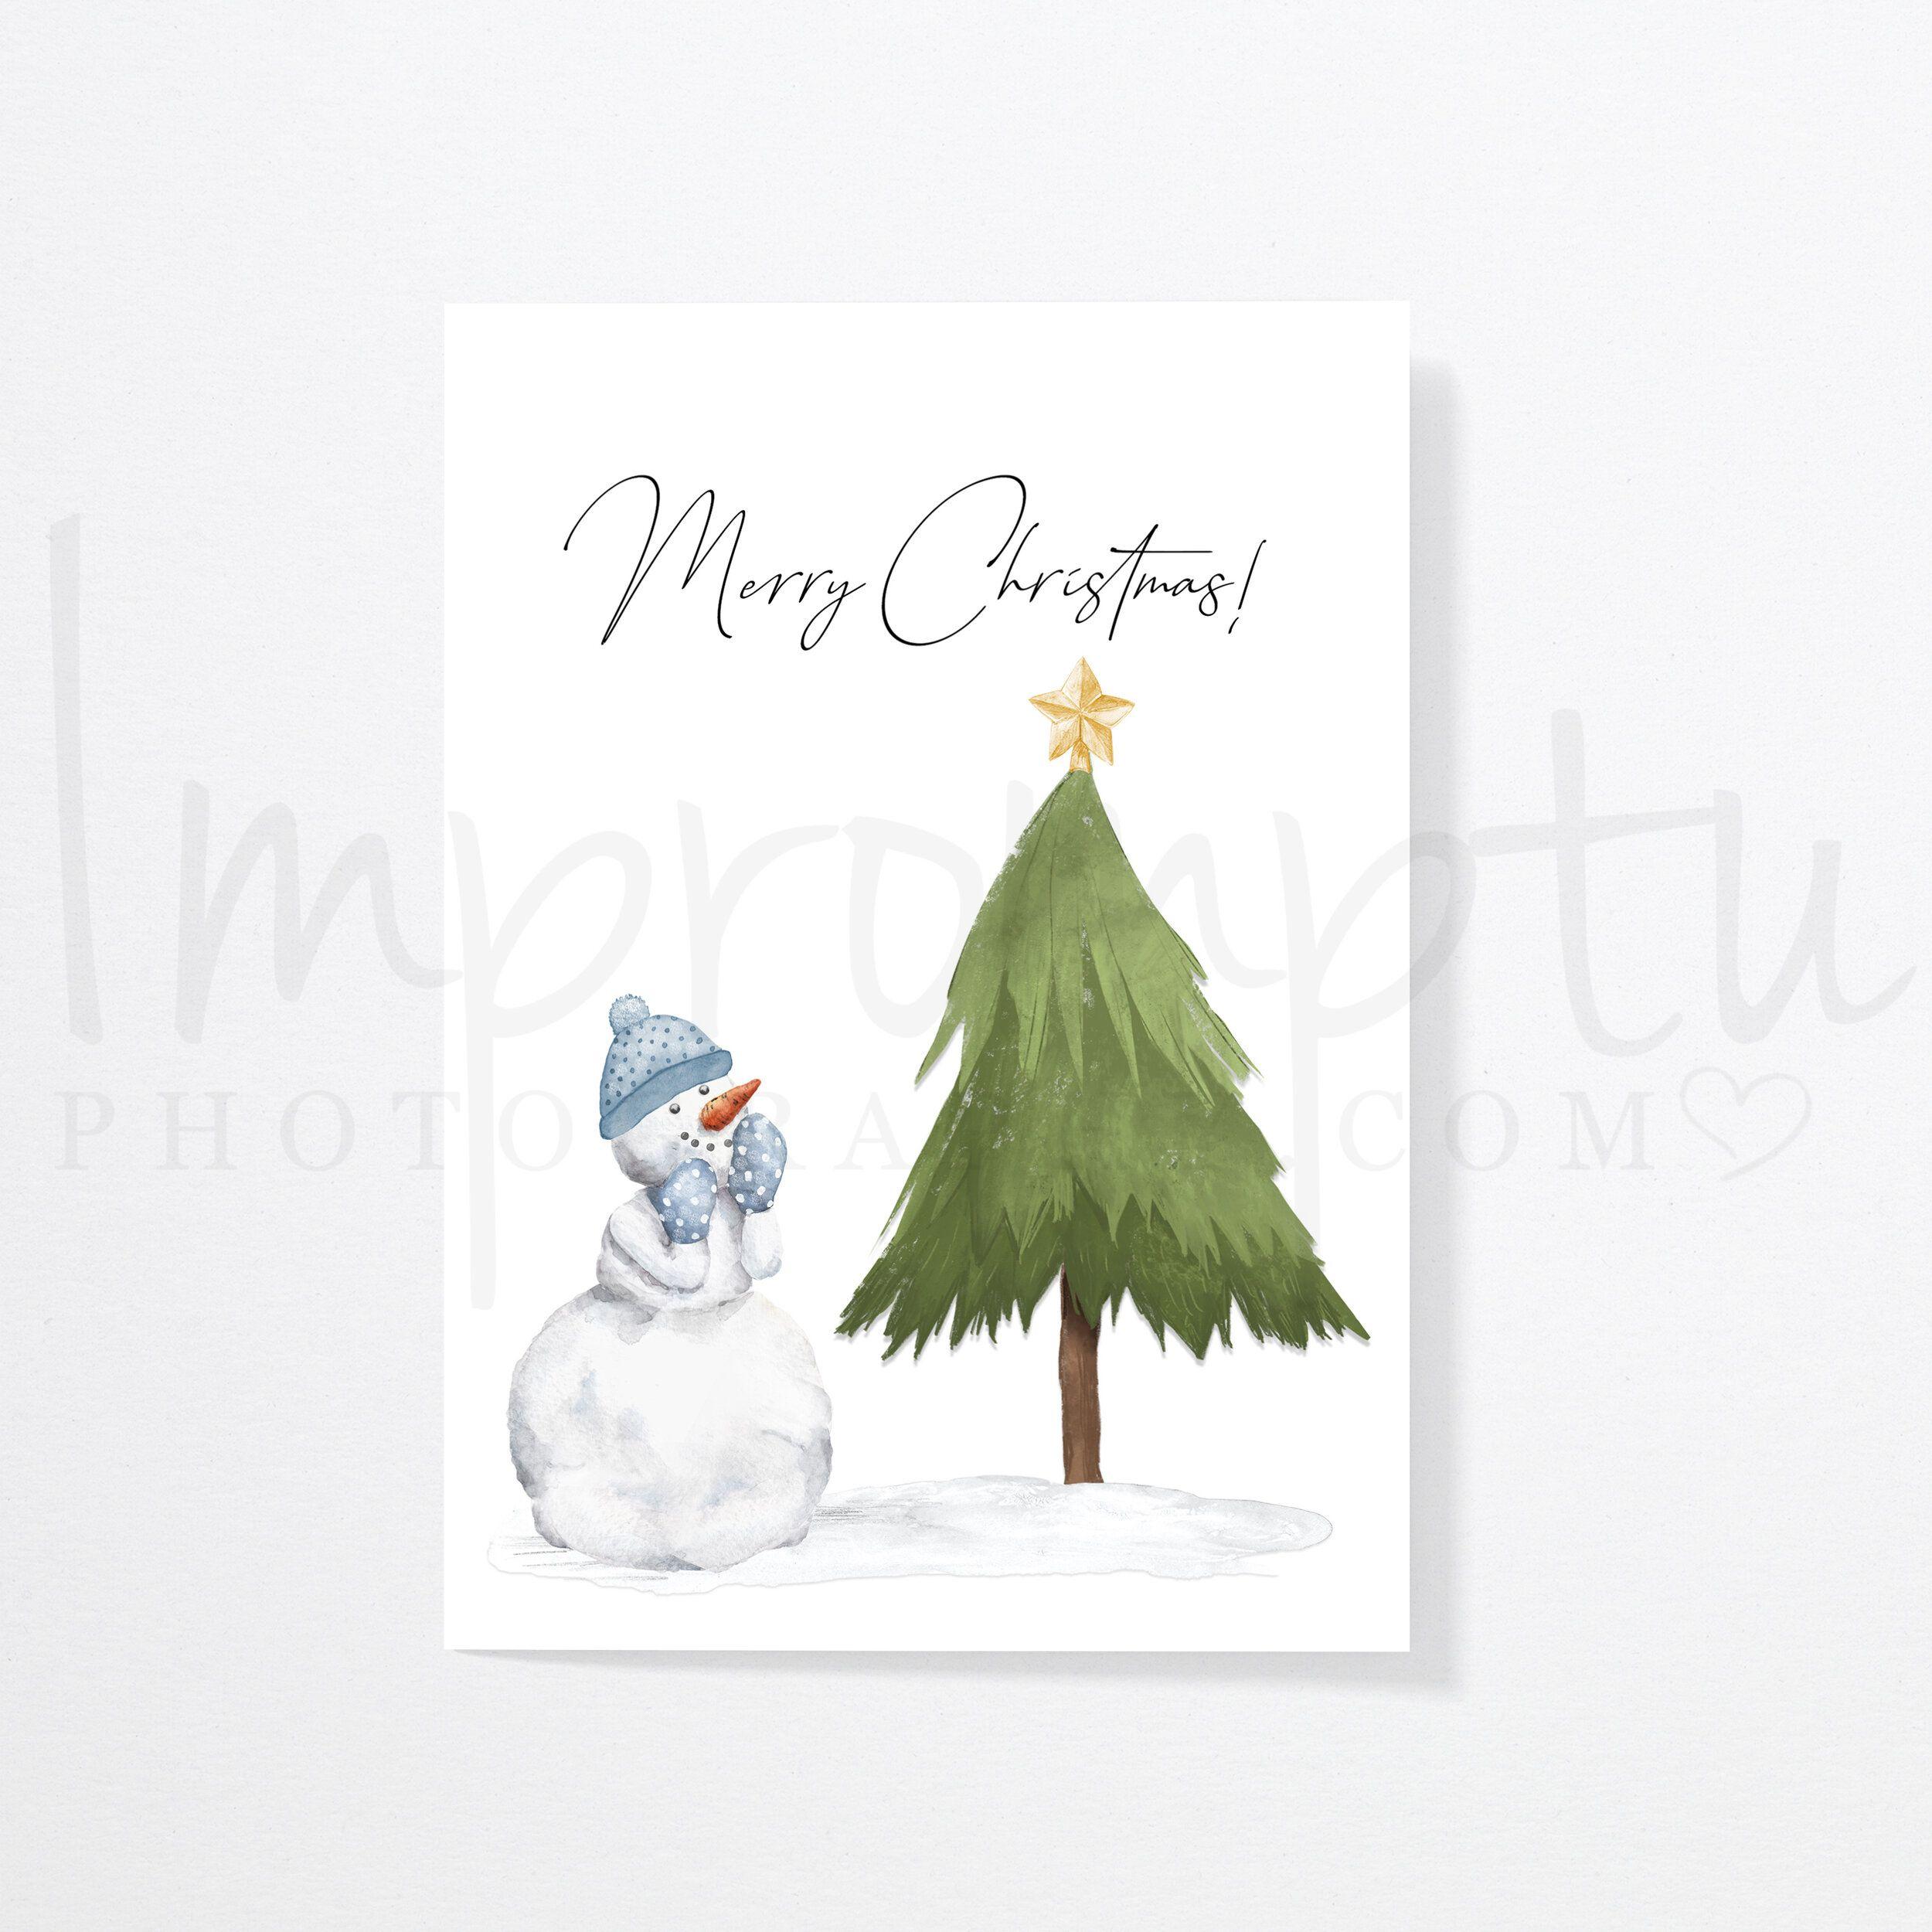 5x7 Printable Christmas Card Snowman Impromptu Photography Printable Christmas Cards Christmas Cards Christmas Printables